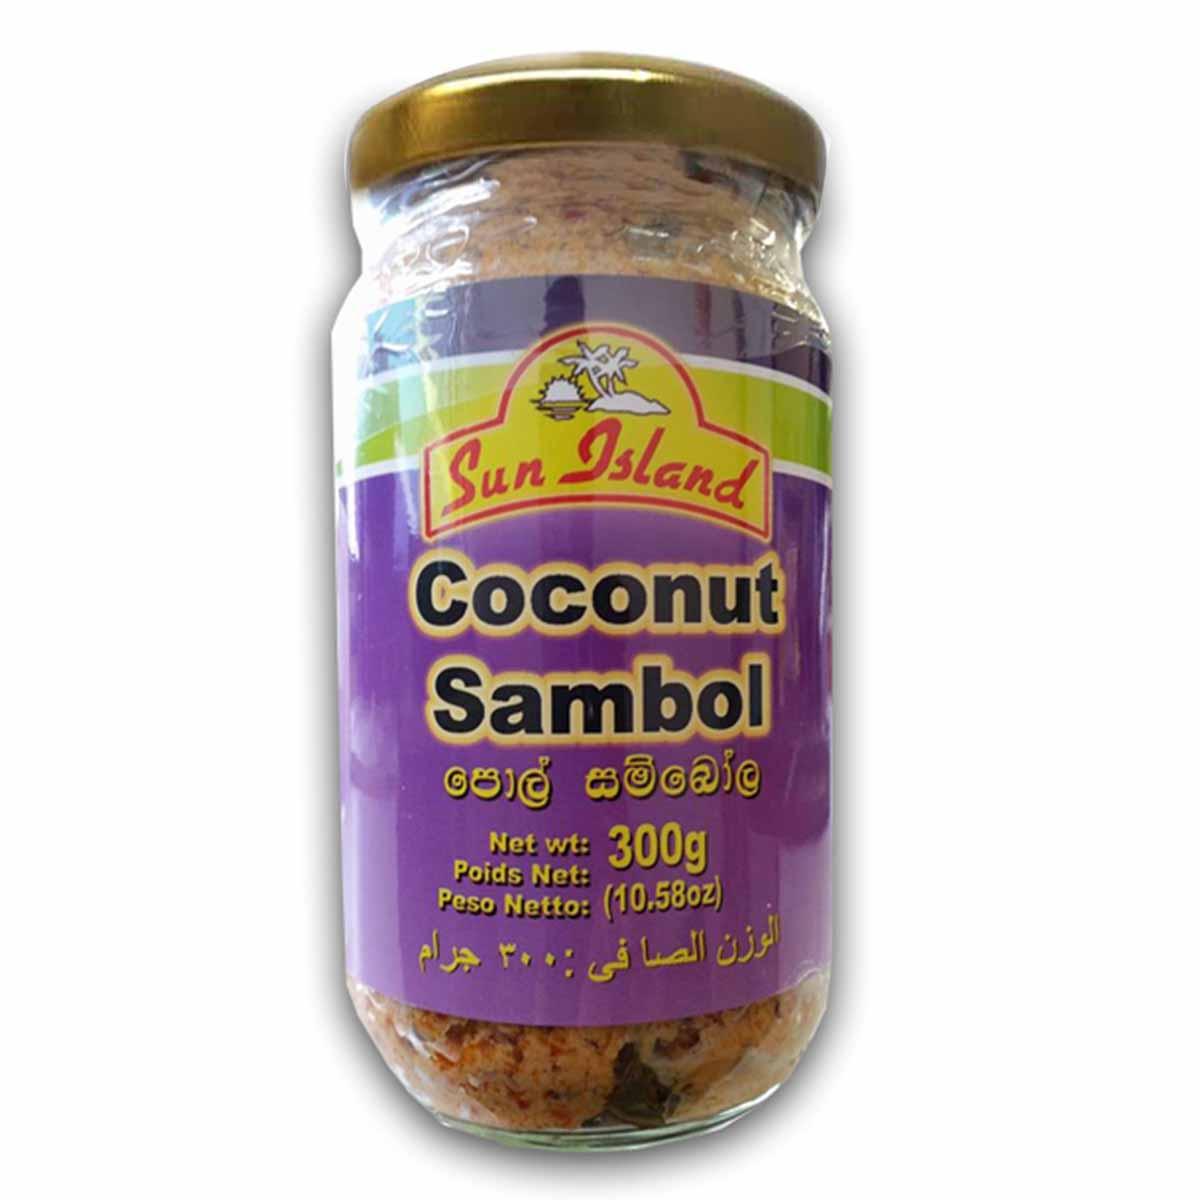 Buy Sun Island Coconut Sambol - 300 gm